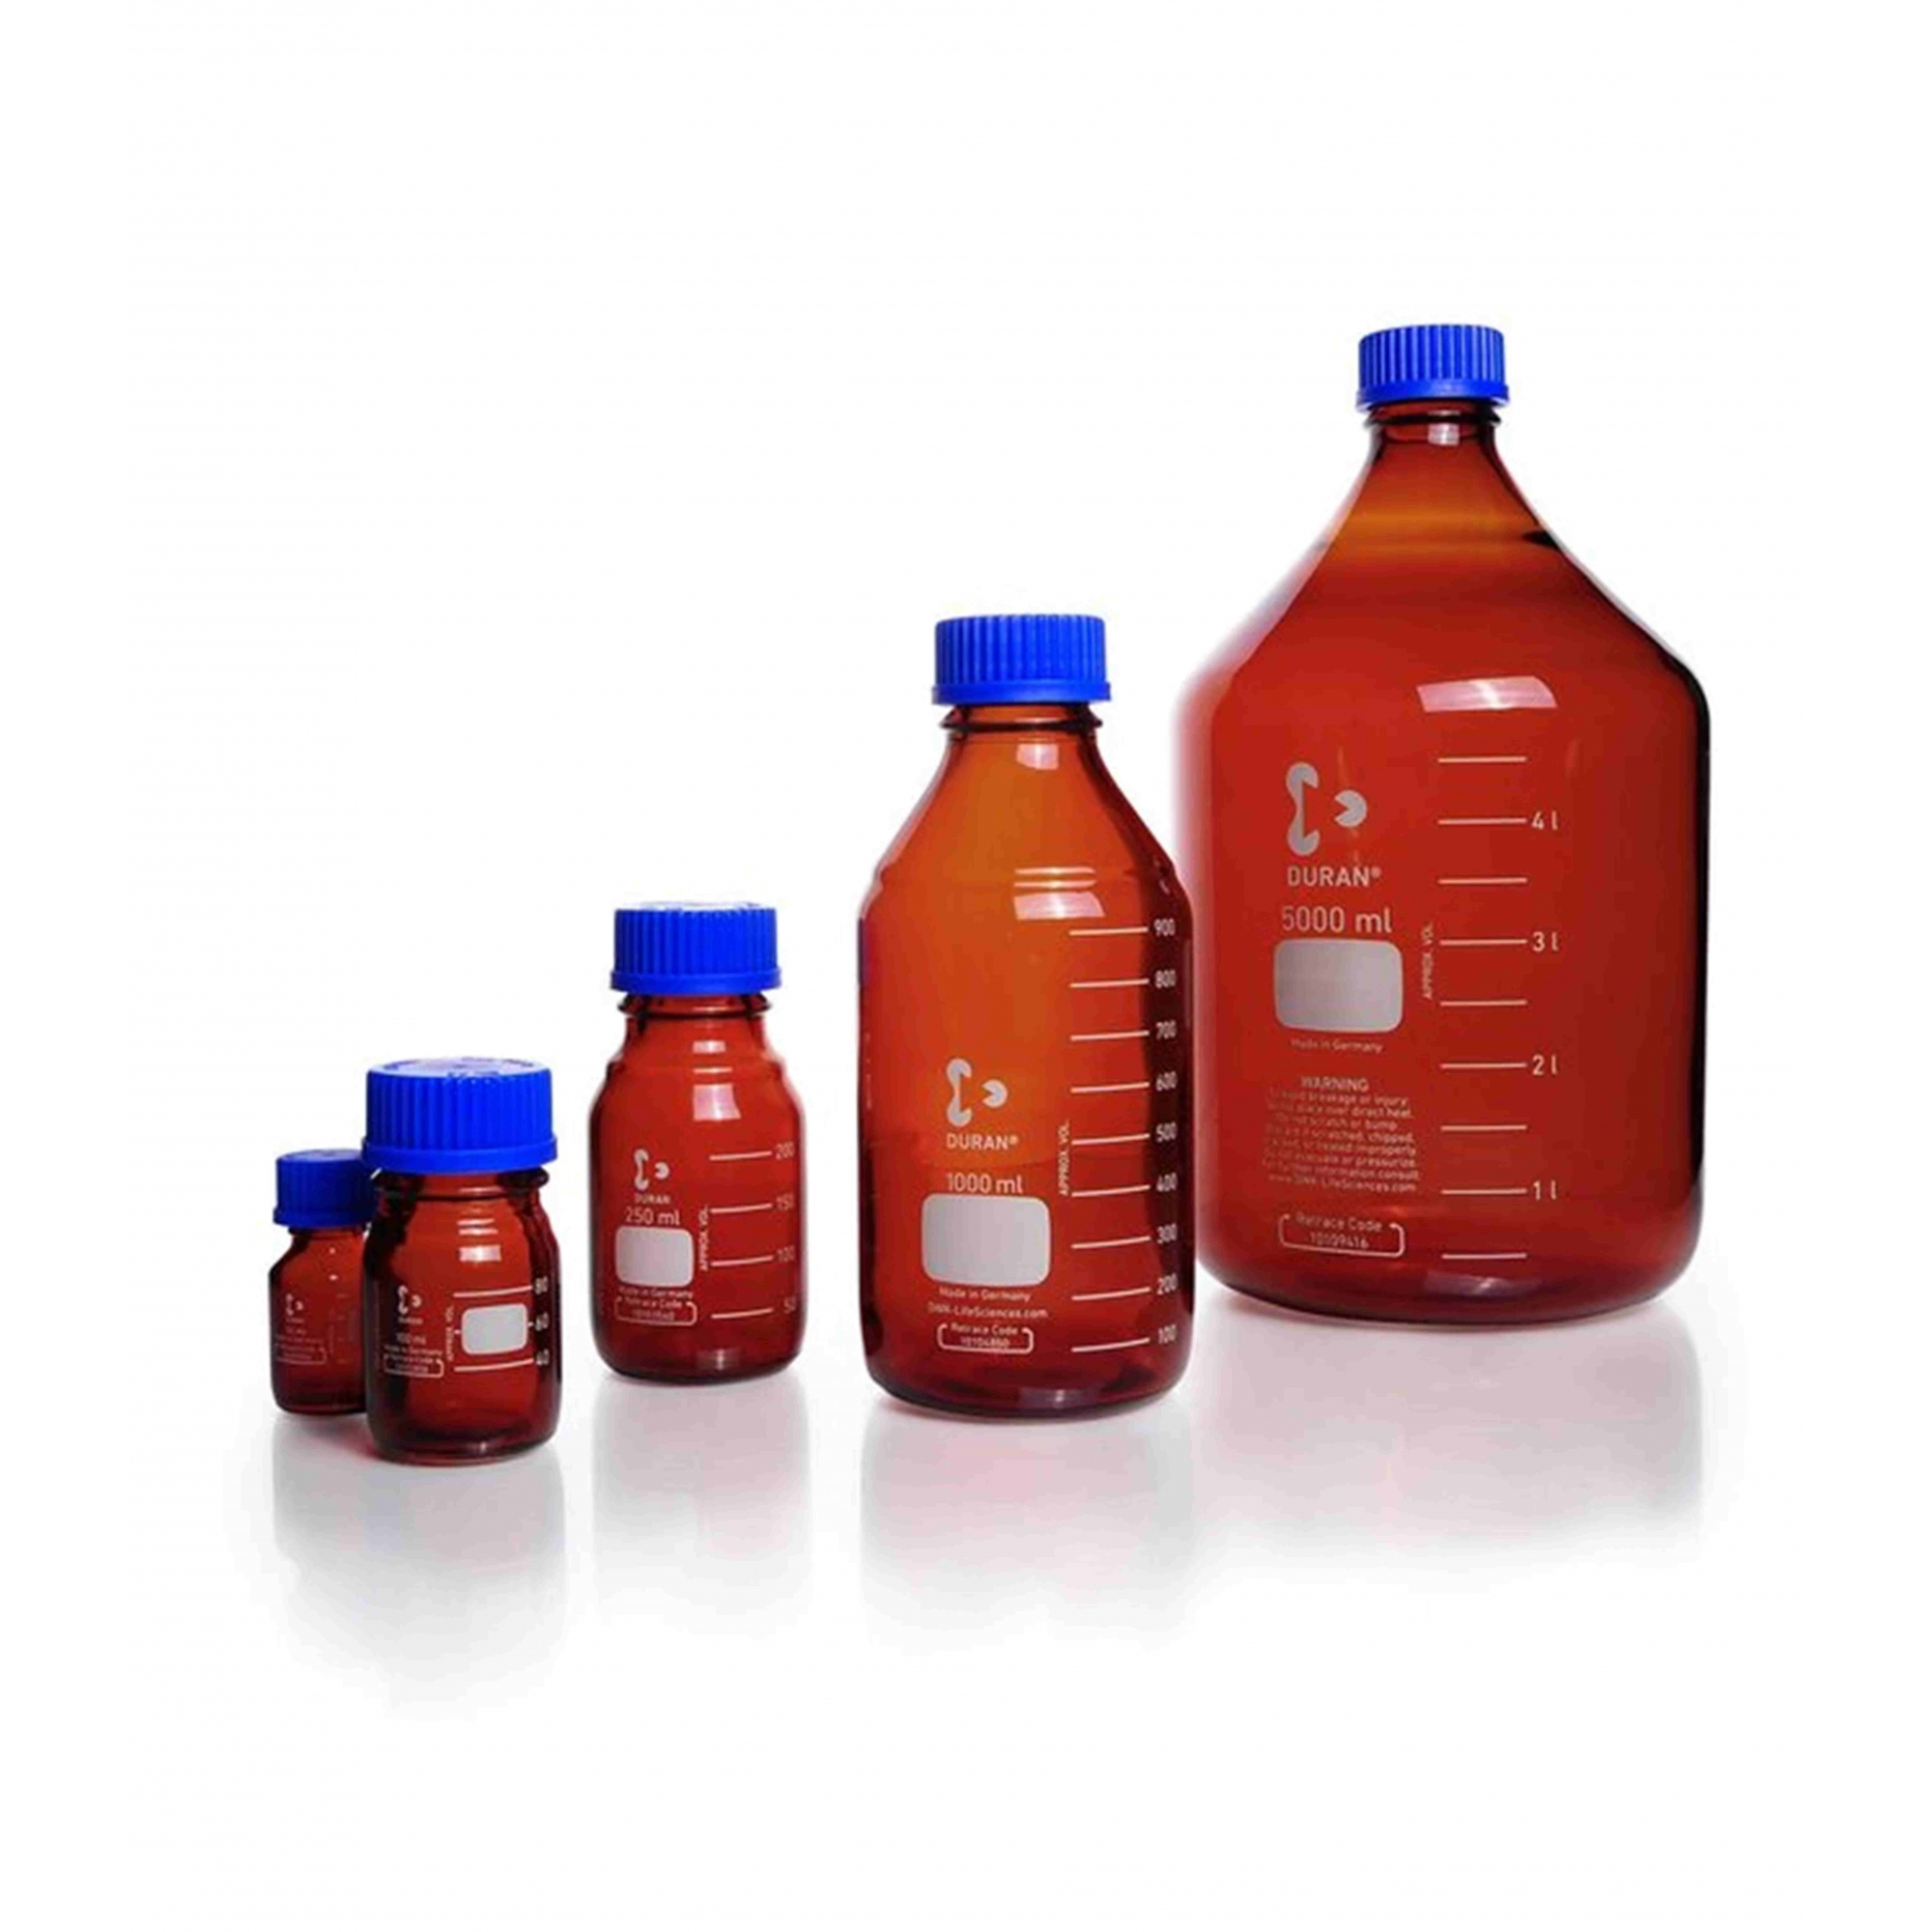 Frasco Reagente Âmbar Tampa Azul 25 ml - Schott - Cód. 21806145